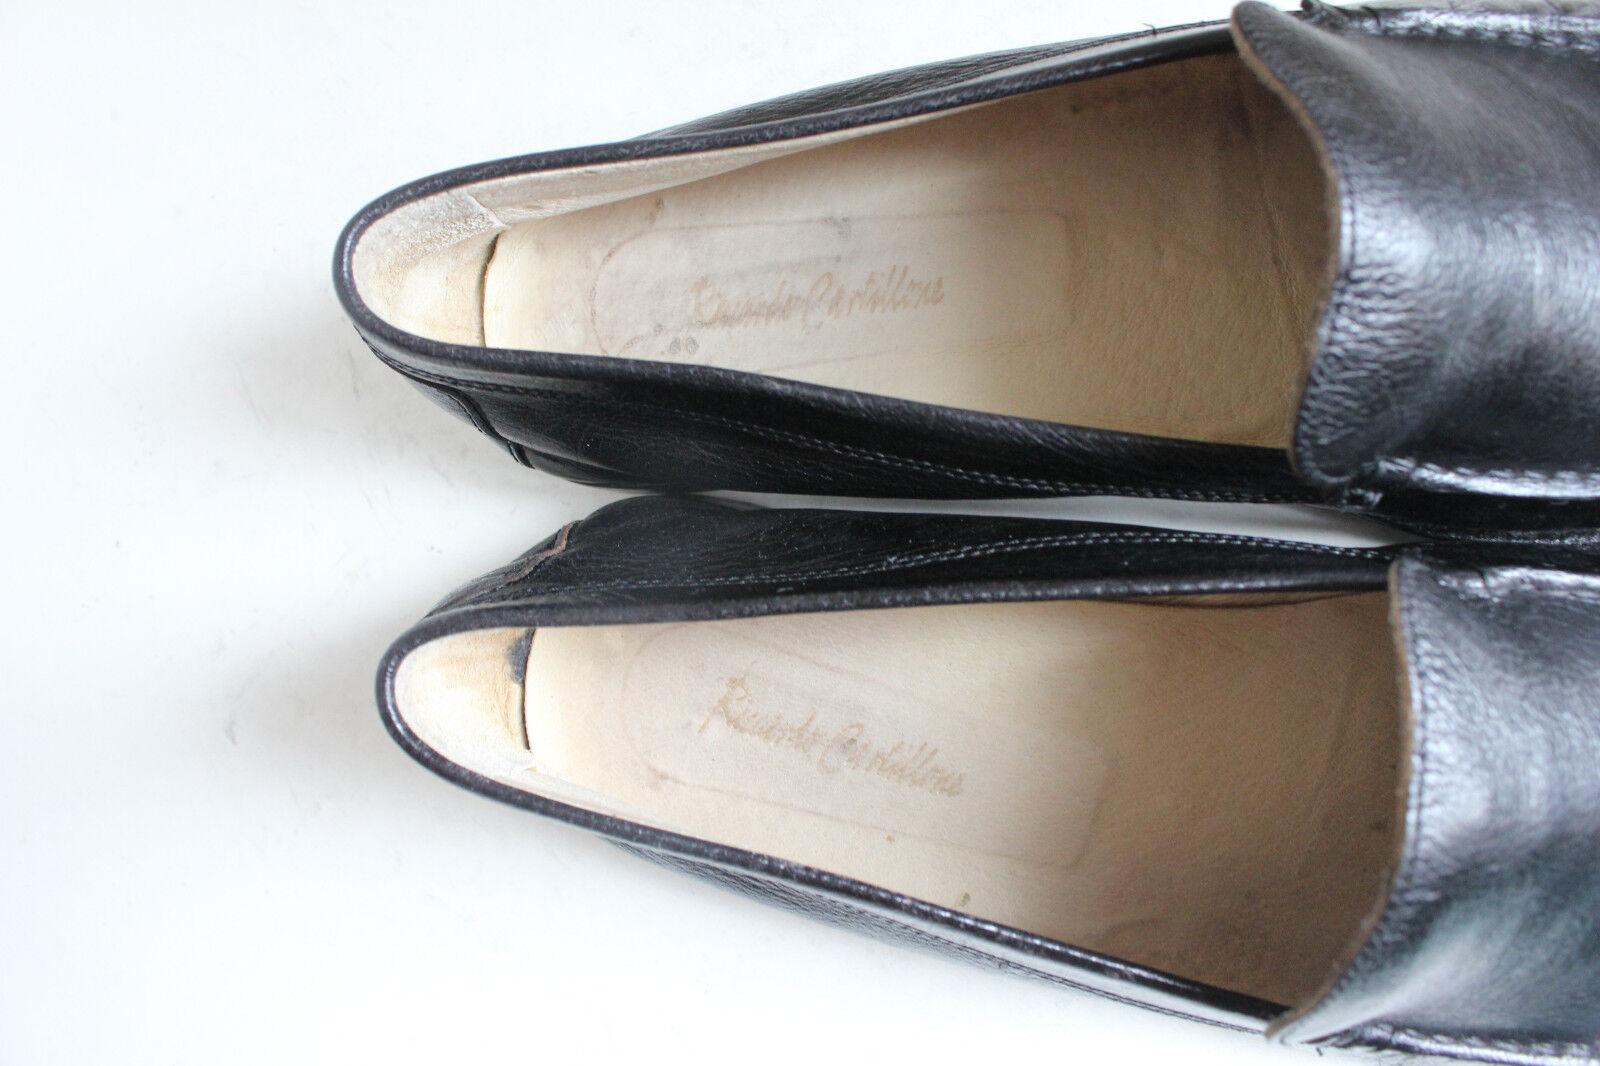 Riccardo Schuhe Cartillone Elegante Luxus Slipper Schuhe Riccardo Voll Echtleder Schwarz 44-44,5 d86d2f